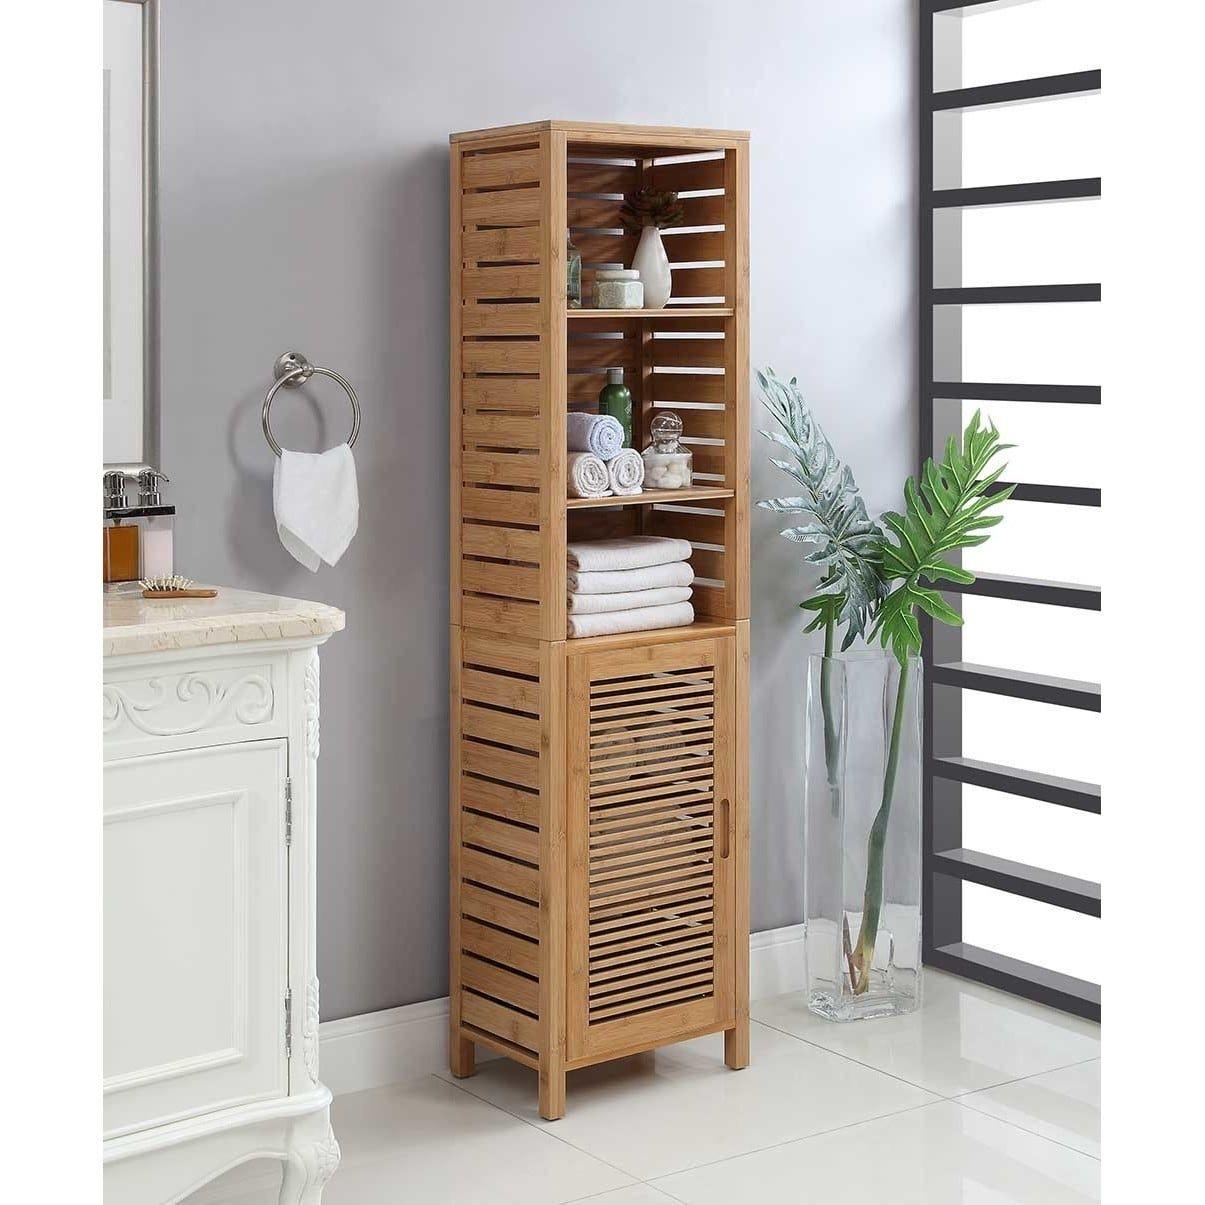 Bracken Tall Brown, Linon(Bamboo) Bathroom